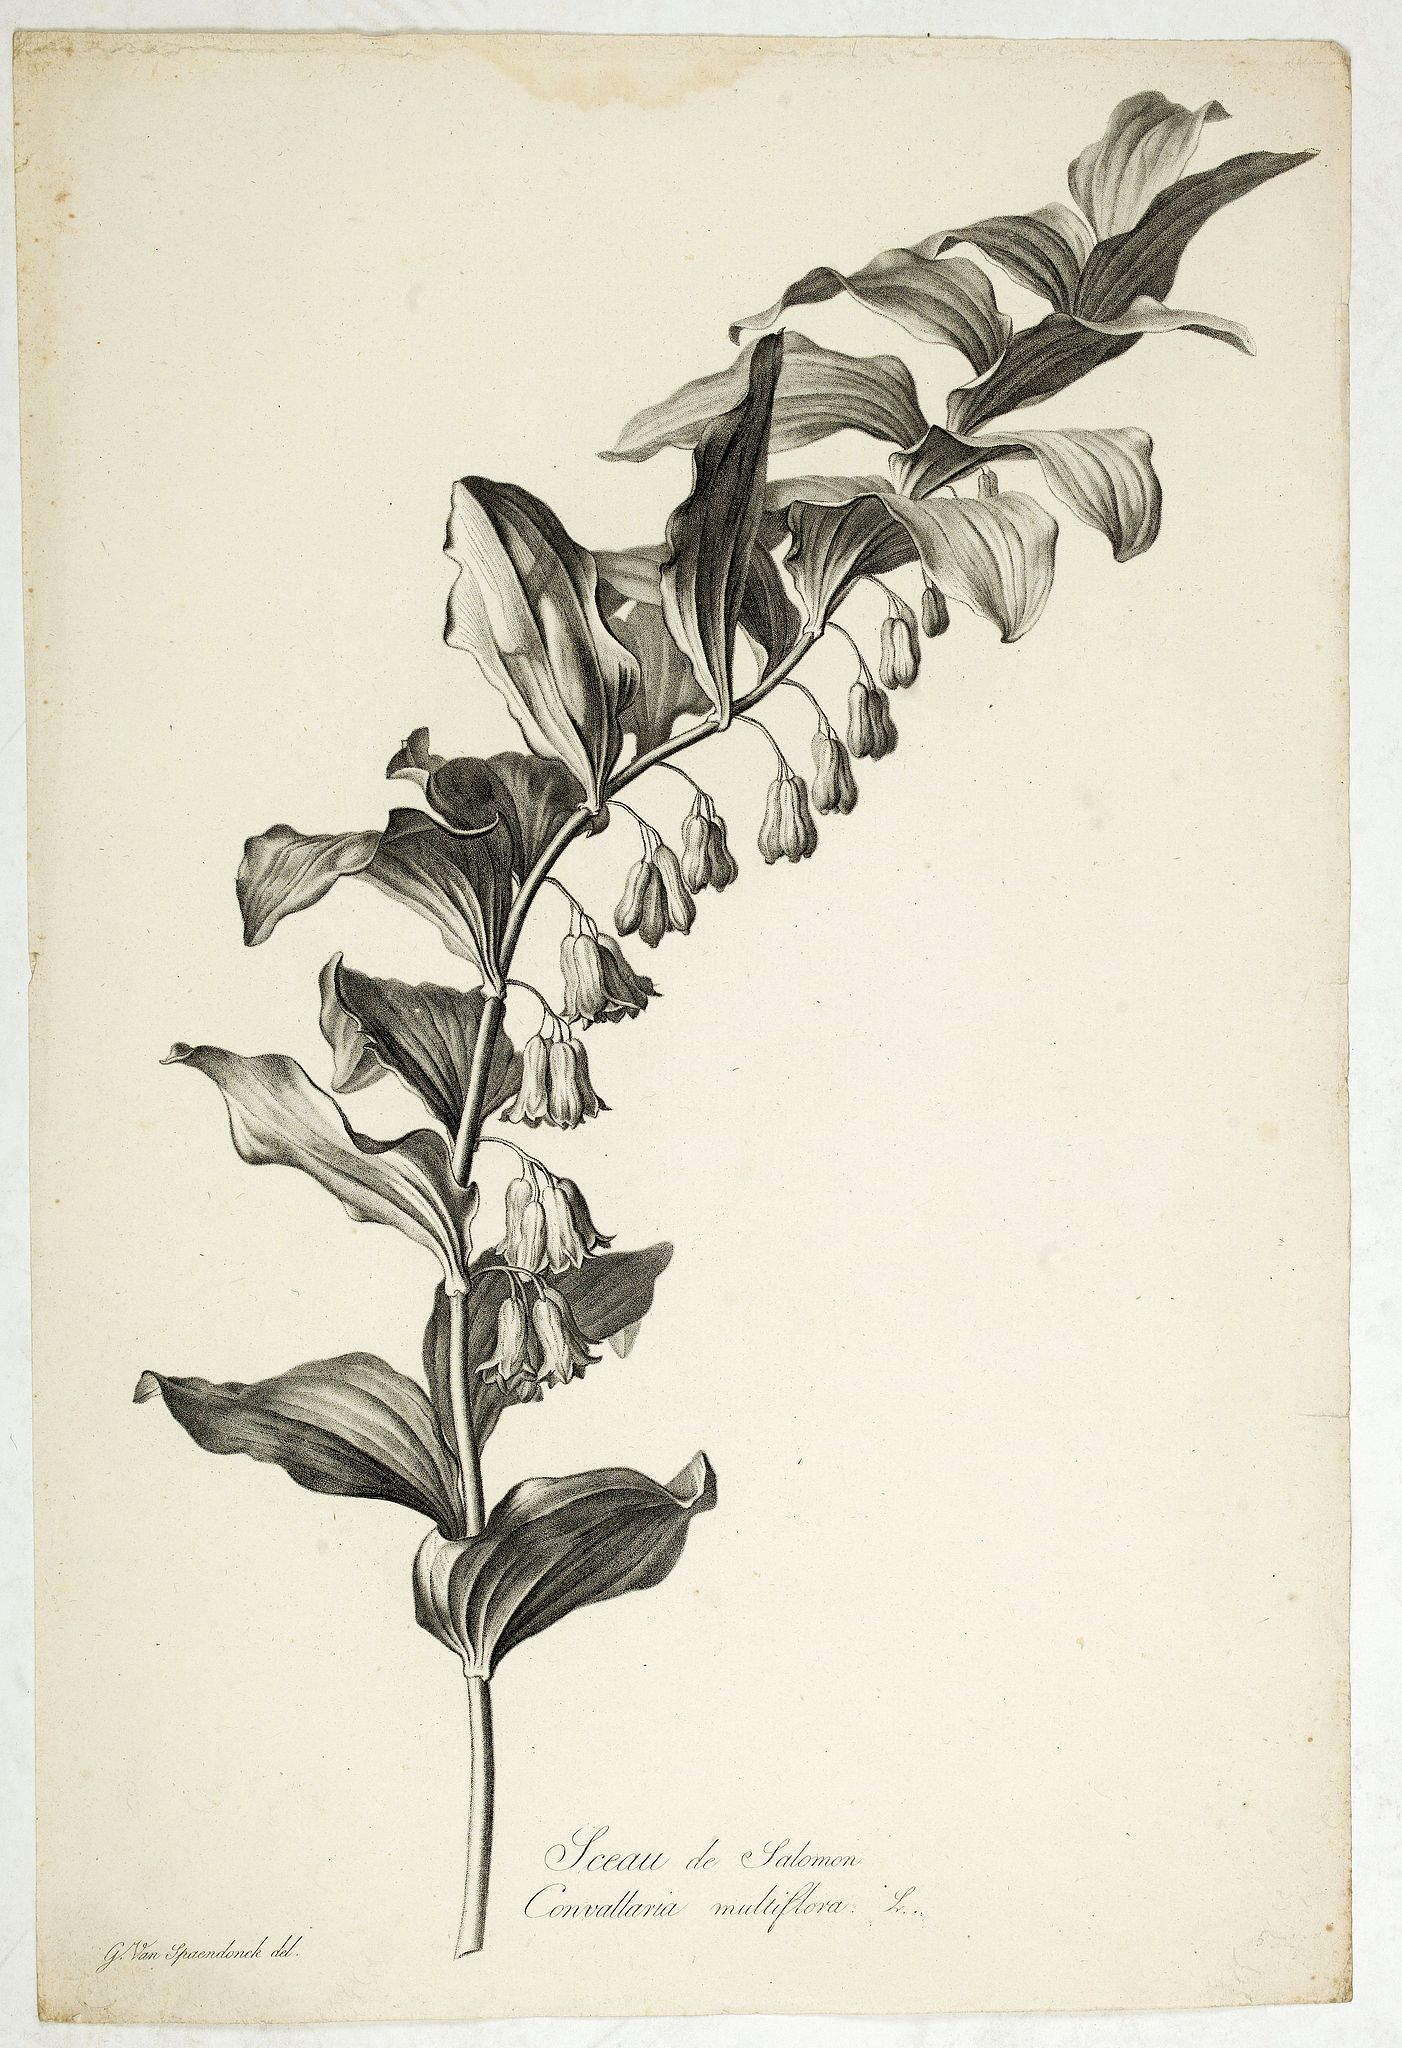 SPAENDONCK, Van. G. -  Sceau de Salomon. Convallaria multiflora L.